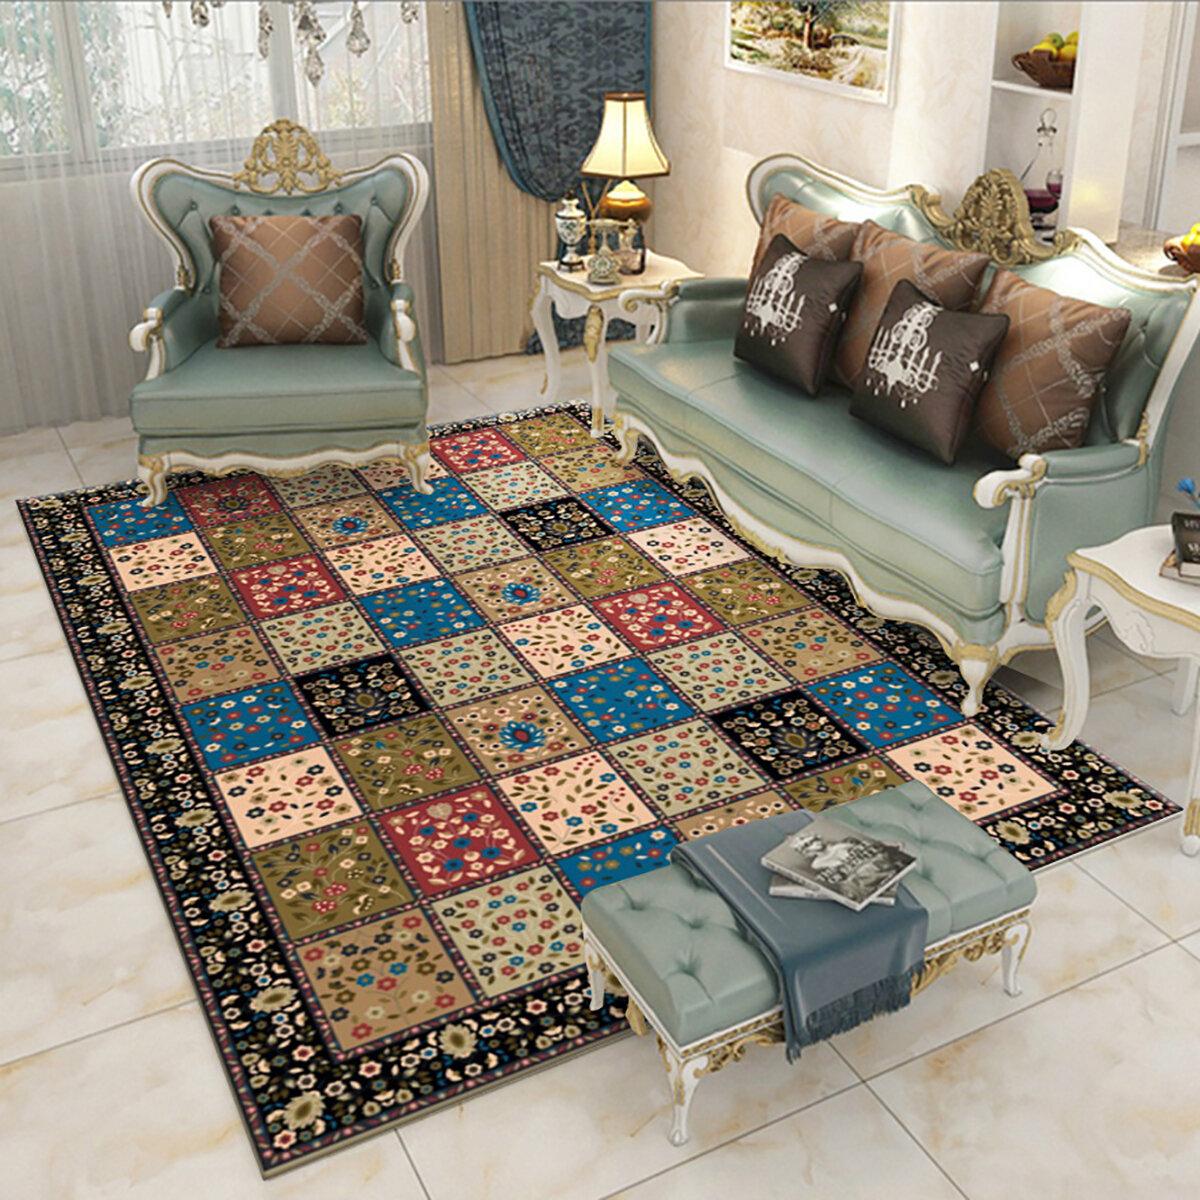 Bohemian Carpet Carpet Rug Bedside Rug Geometric Floor Mat Living Room Bedroom Carpet for Home Decor